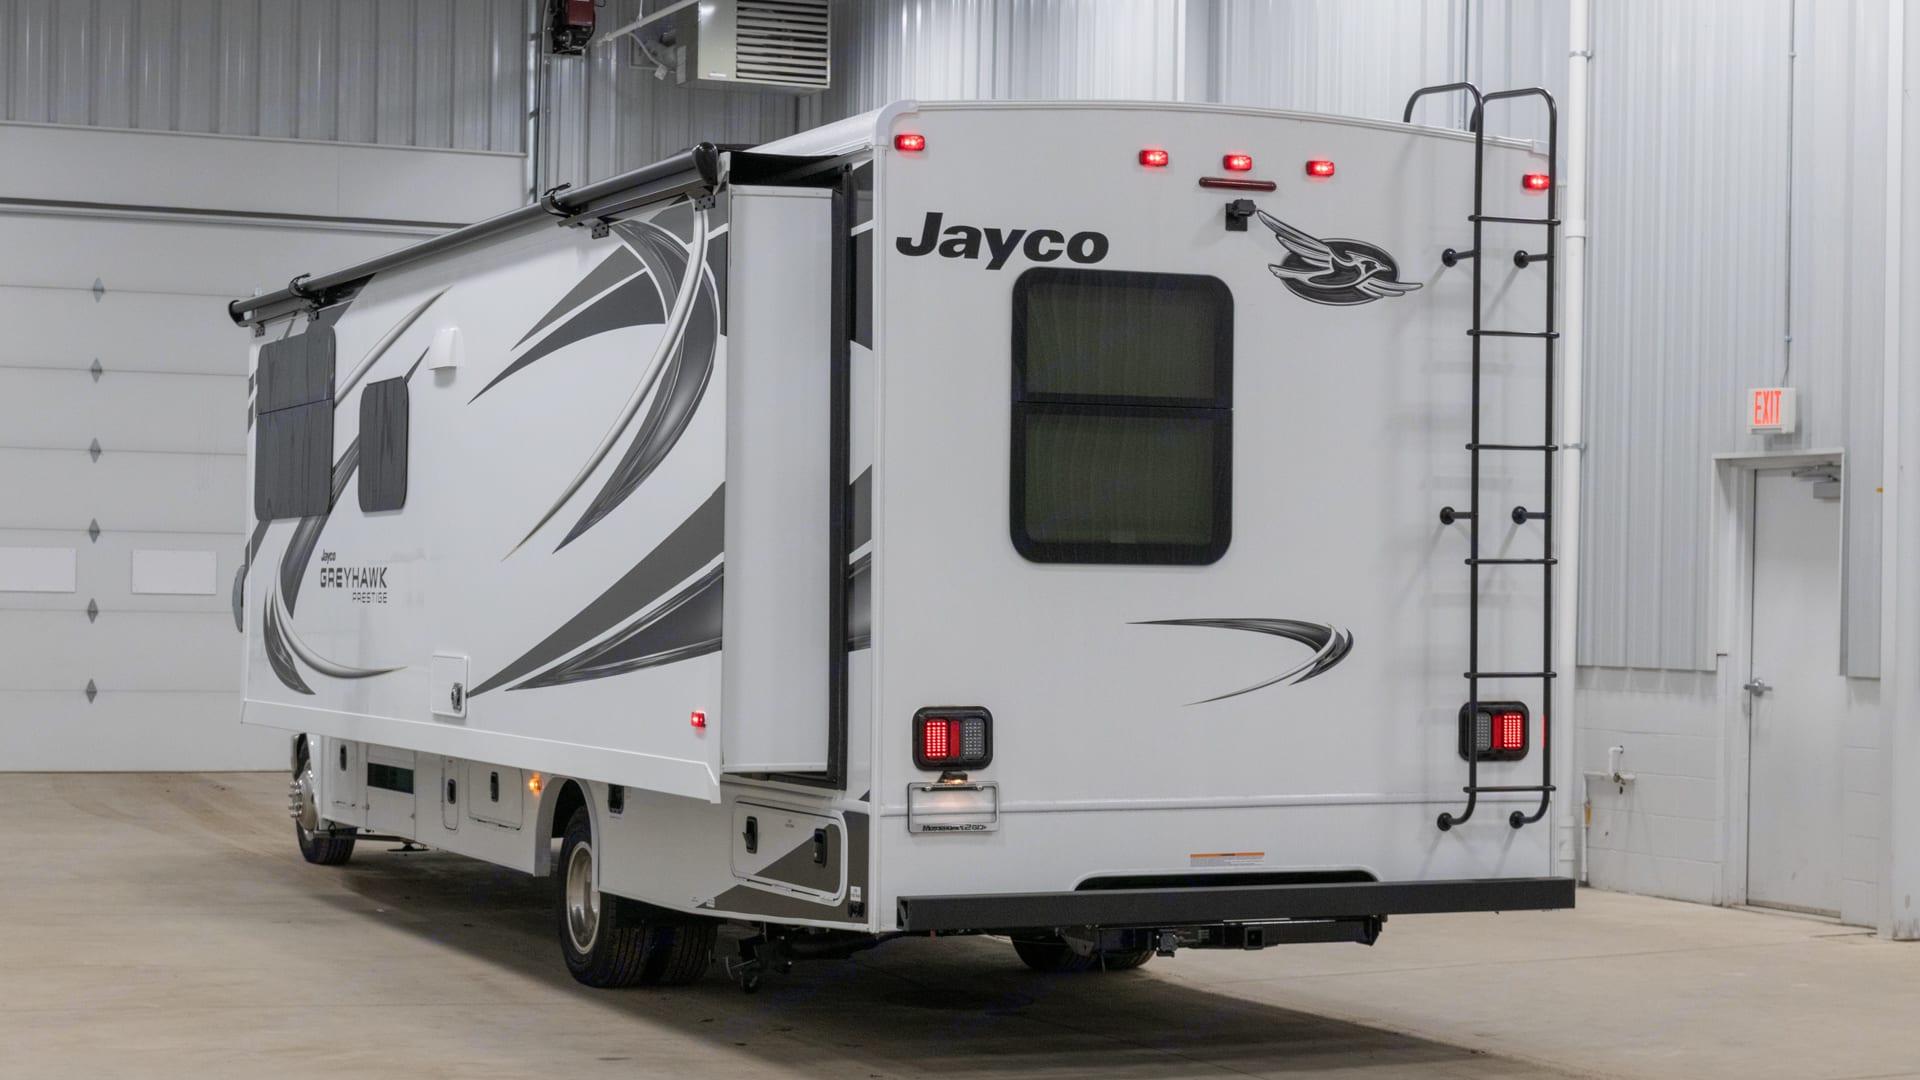 Beautiful 2020 Jayco GreyHawk 30XP Prestige! . Jayco Greyhawk prestige 30XP 2020